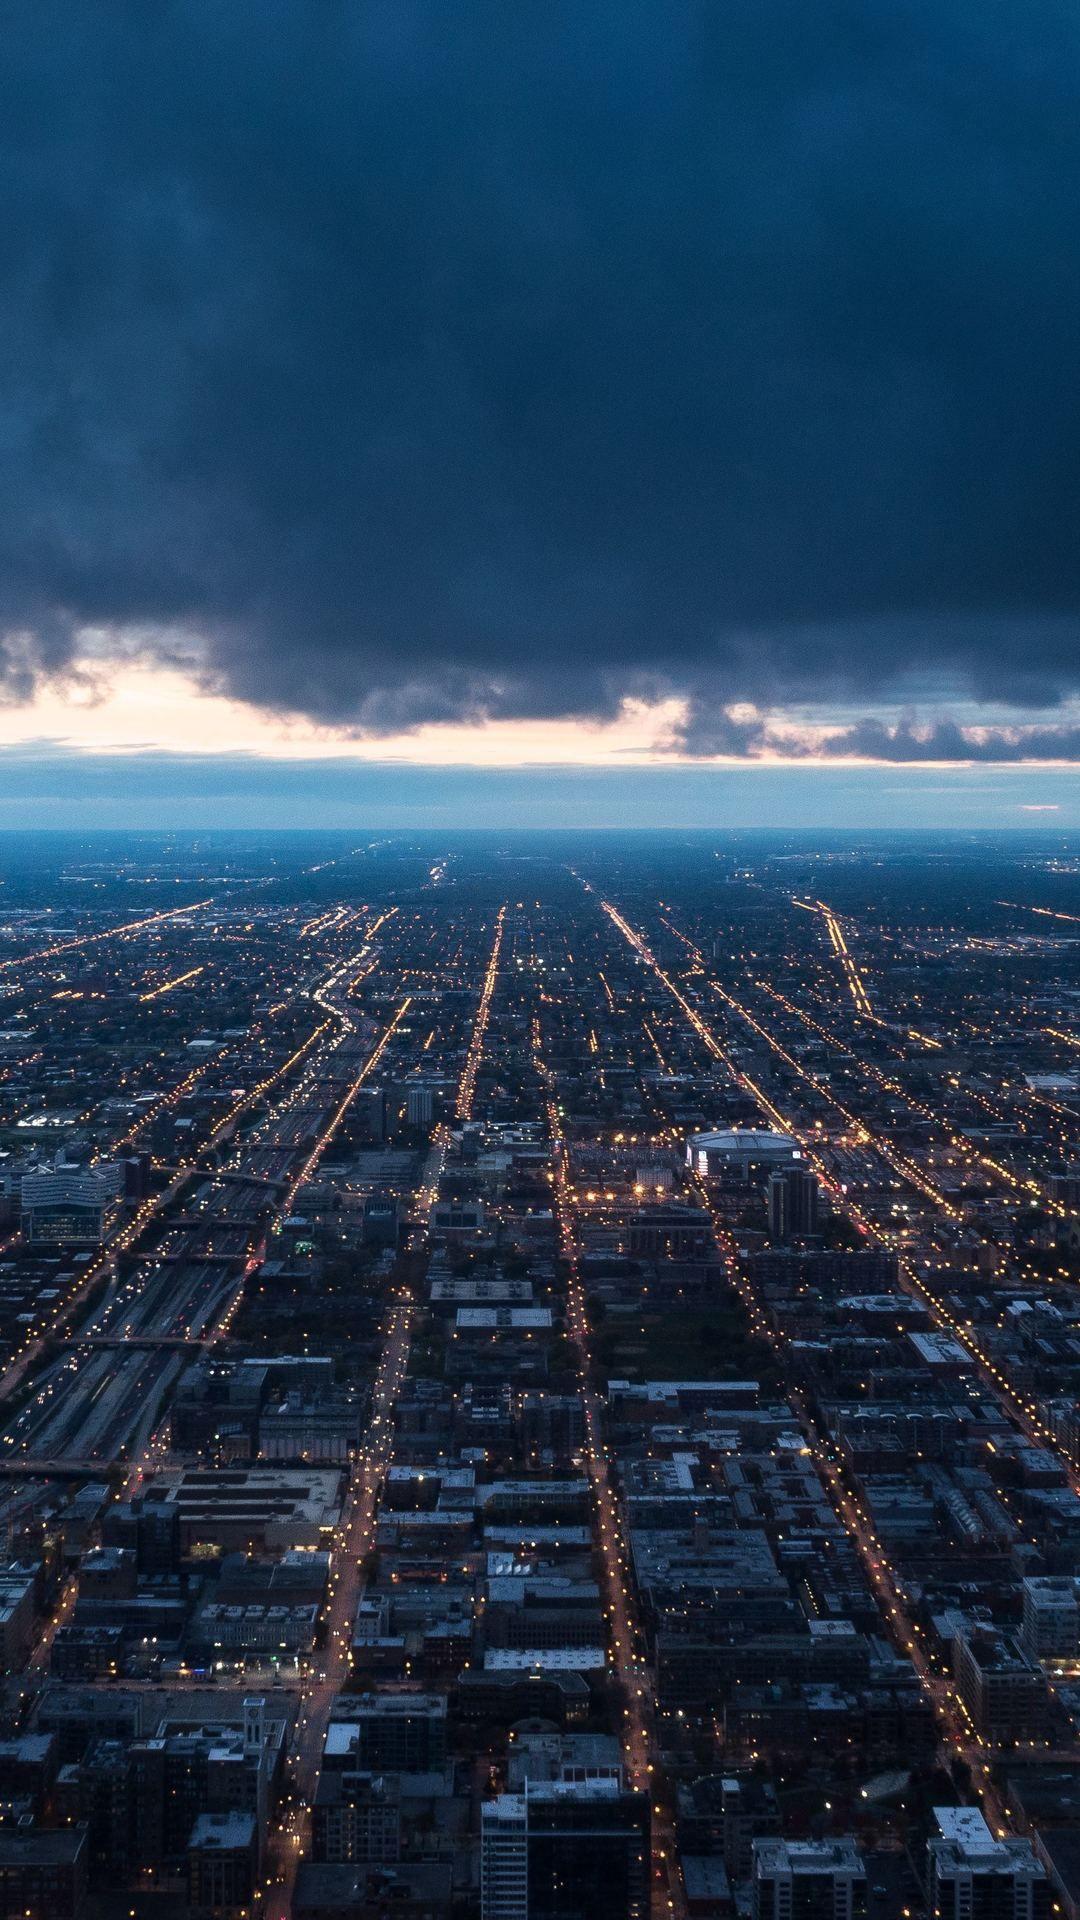 Night City Top View